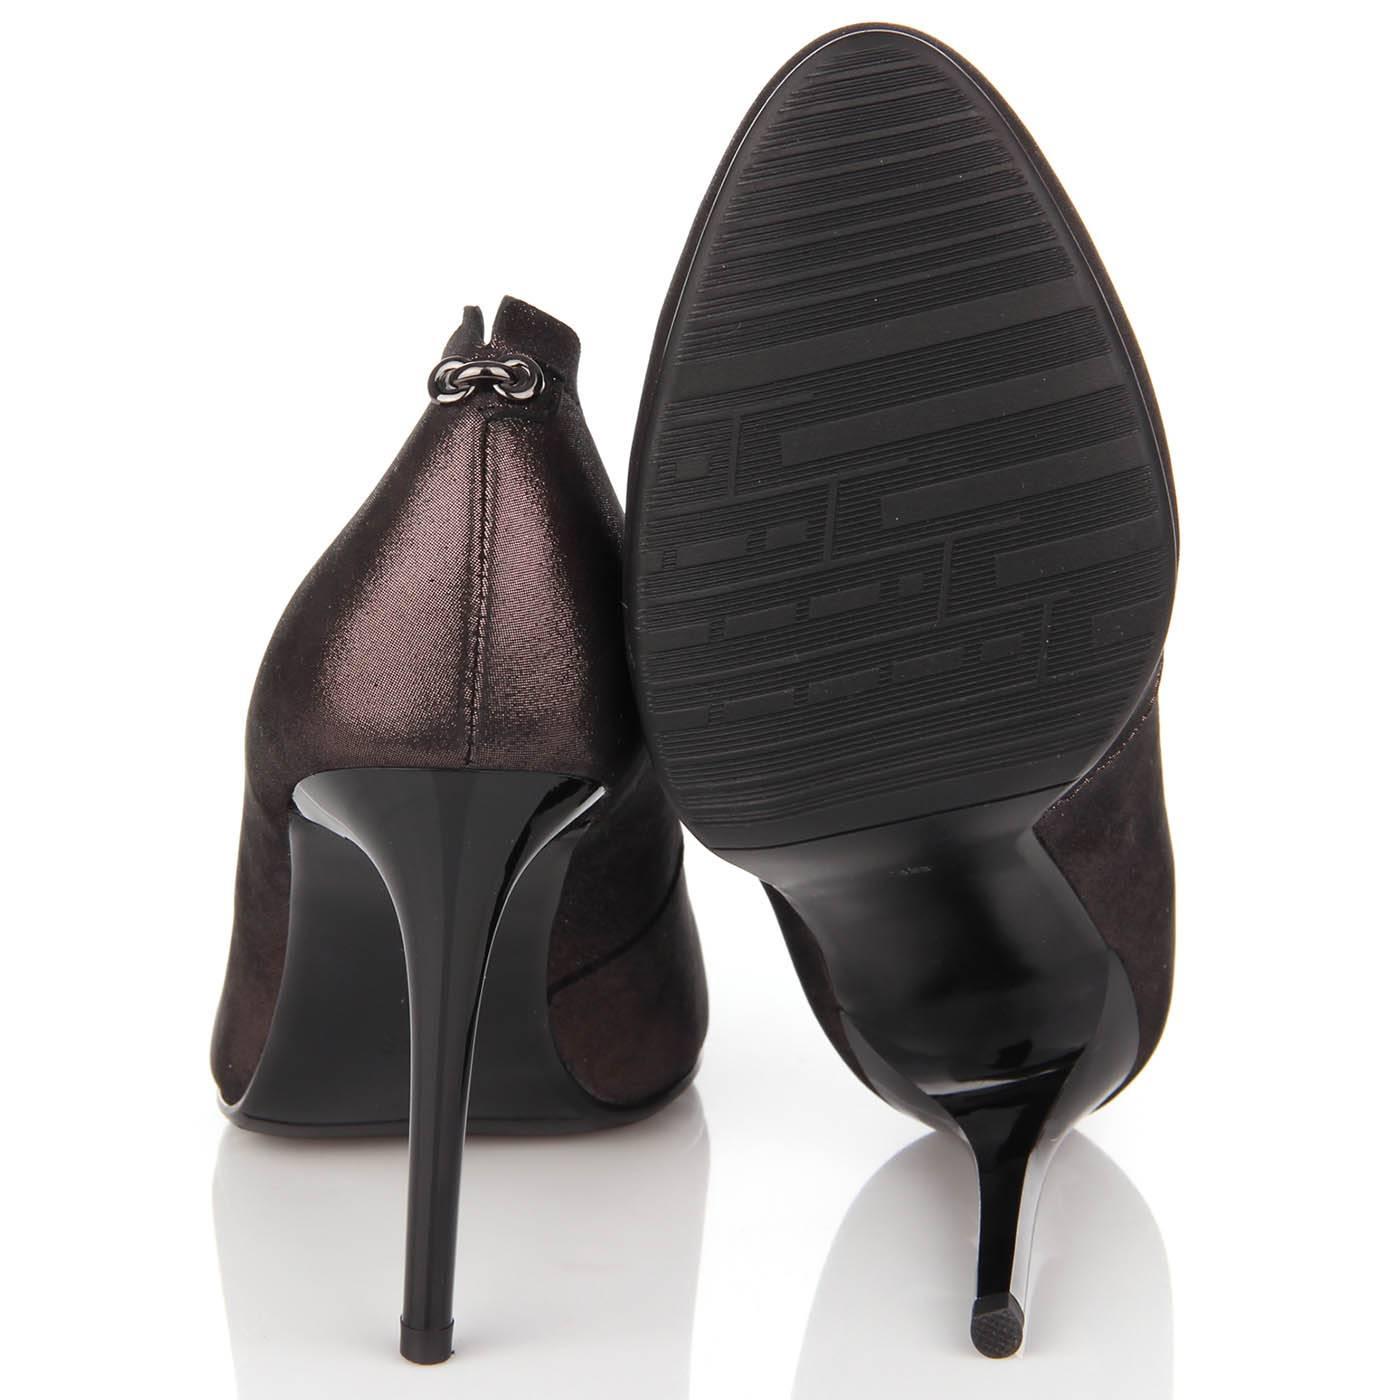 Туфлі жіночі ditto 6875 Бронзовий купить по выгодной цене в интернет ... 60c1c09ab9f46